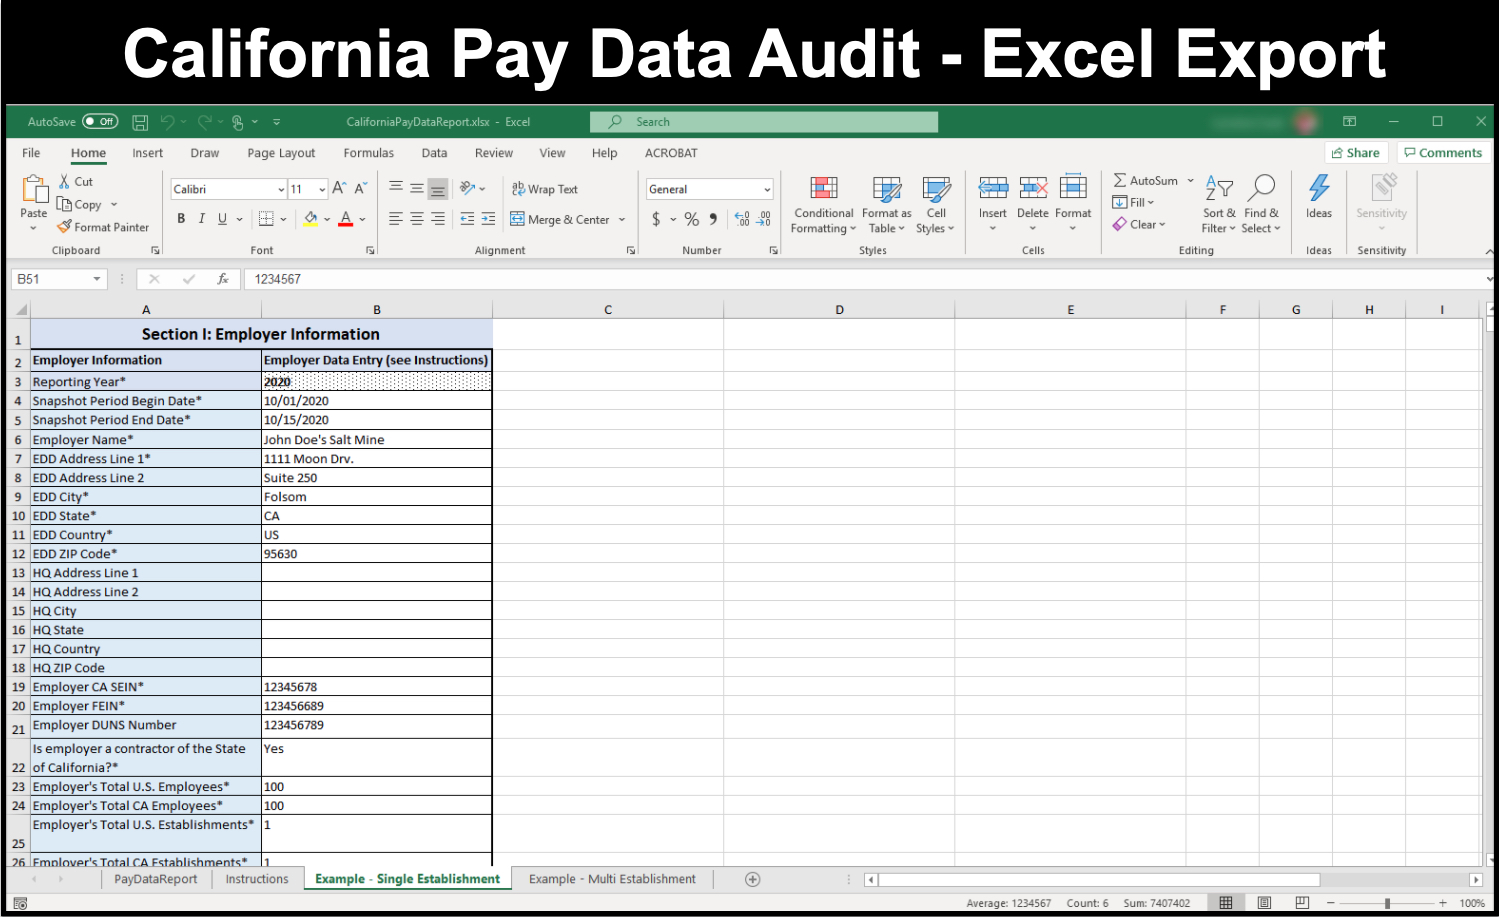 California Pay Data Audit Export Report